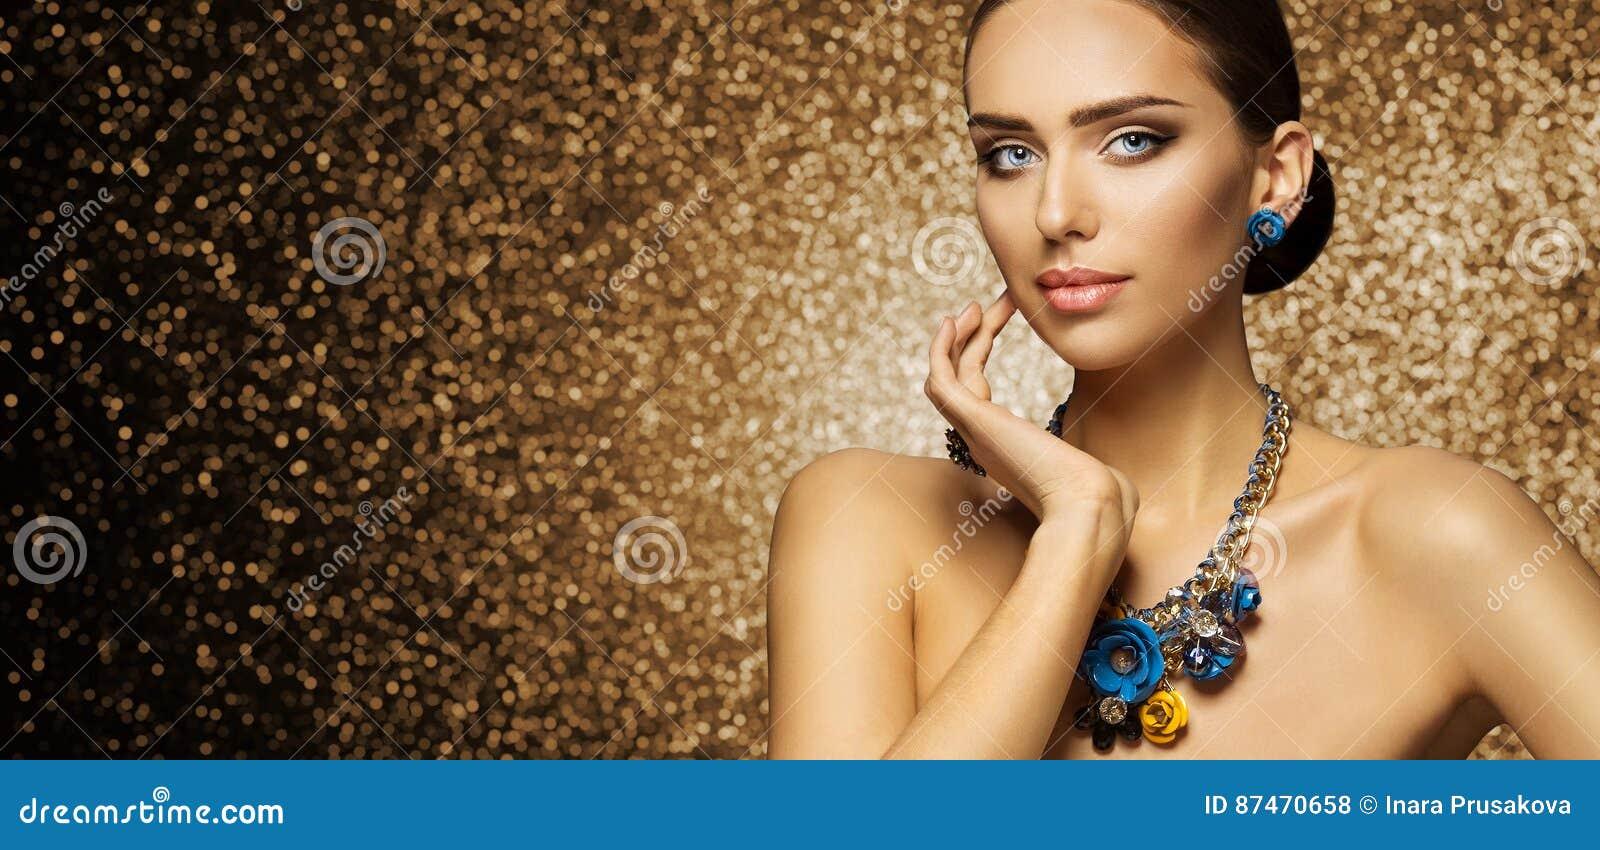 Fashion Model Makeup Portrait, Elegant Woman in Necklace Jewelry